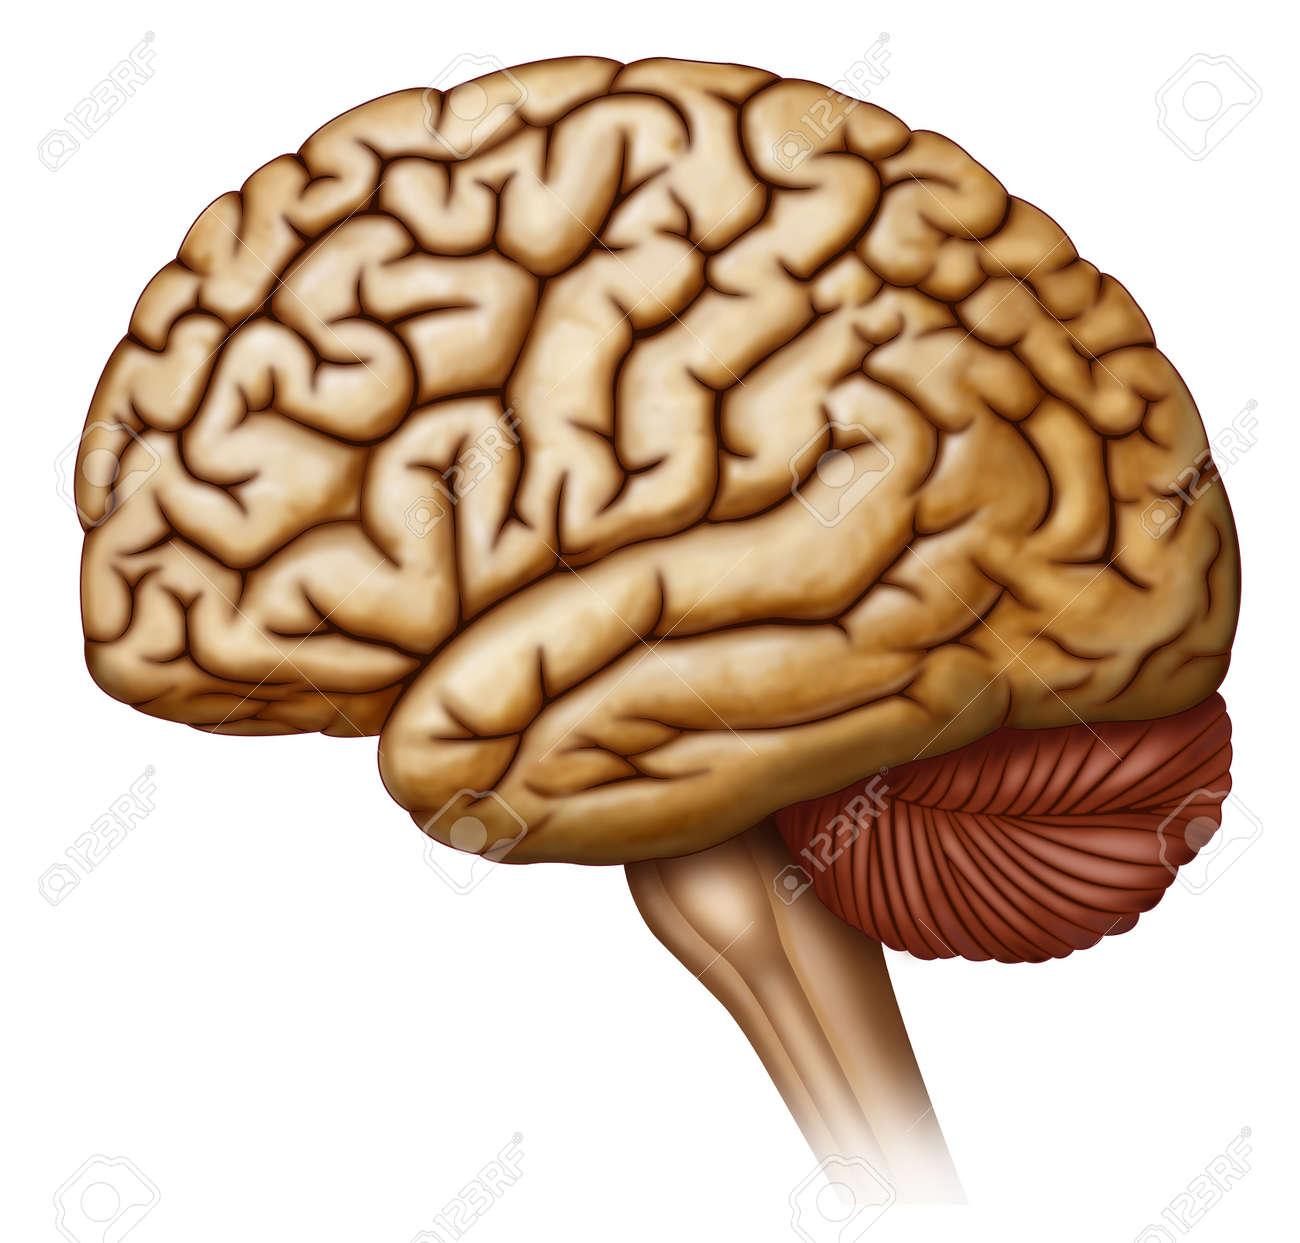 Kopf, Gehirn, Hirnstamm-, Nerven-, Riechkolben, Riechbahn, Hypophyse ...